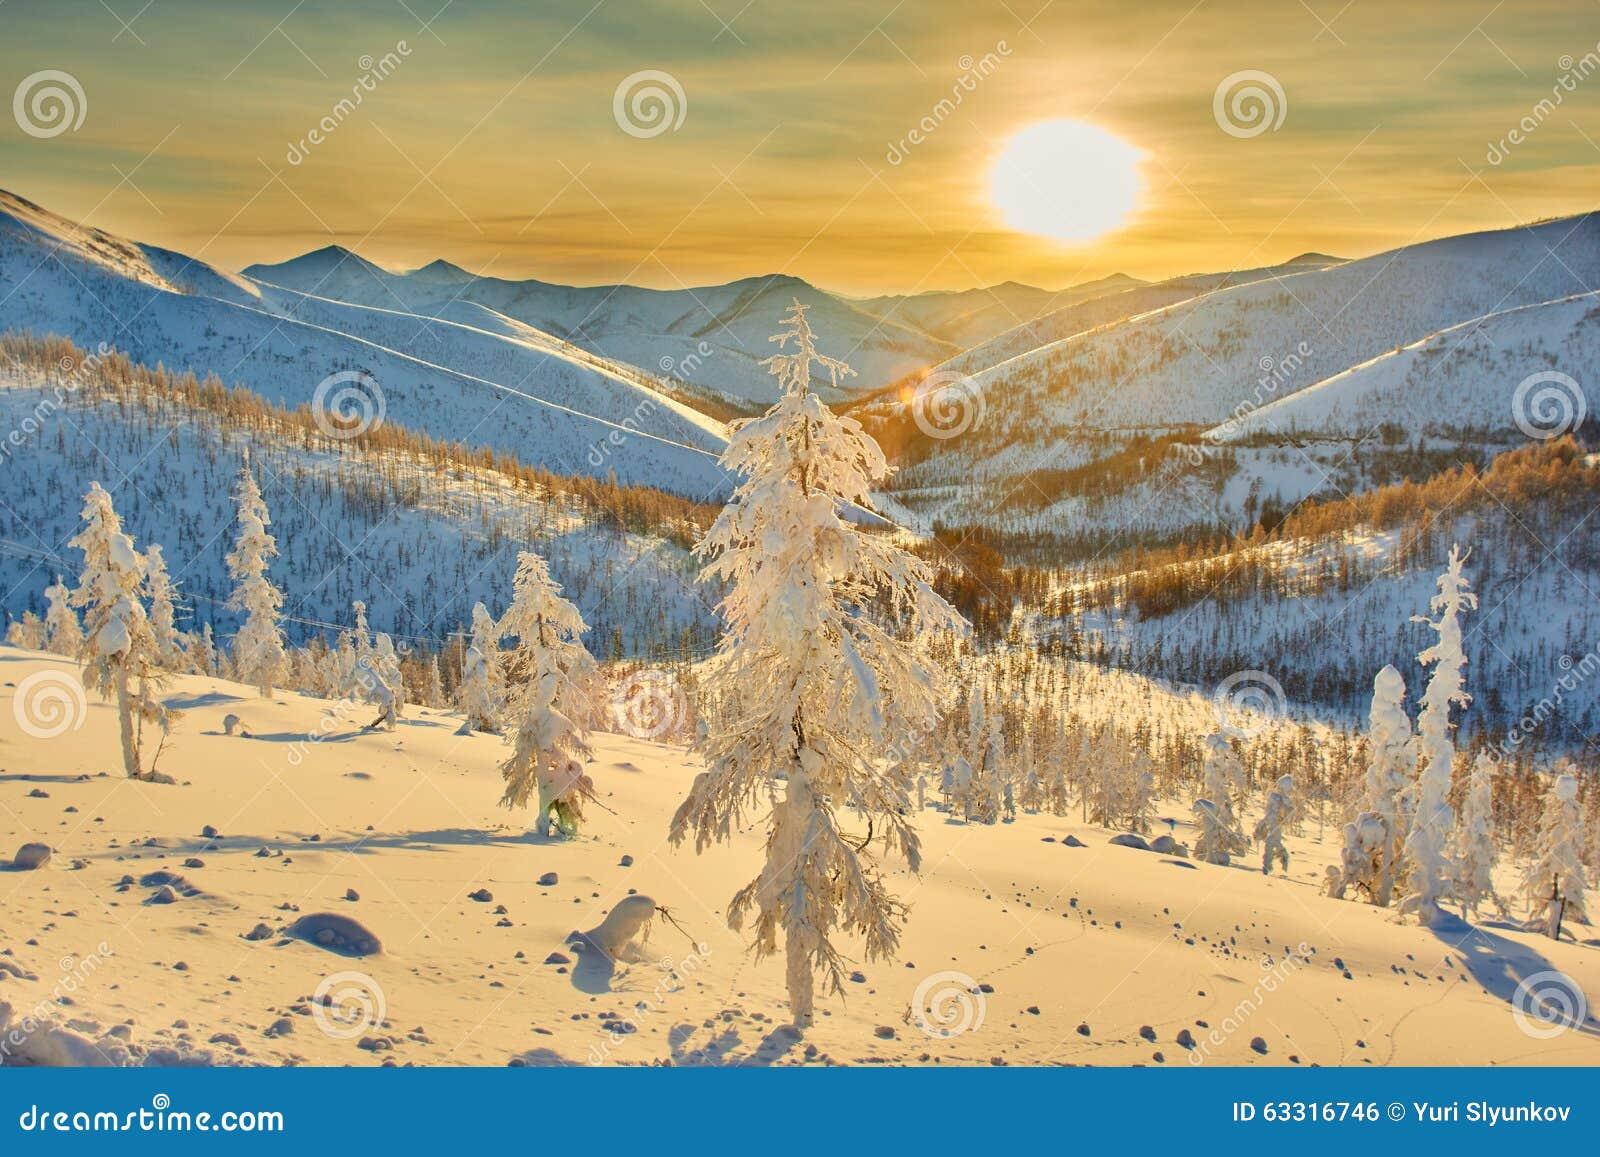 Decline on pass. Winter. Evening. Kolyma